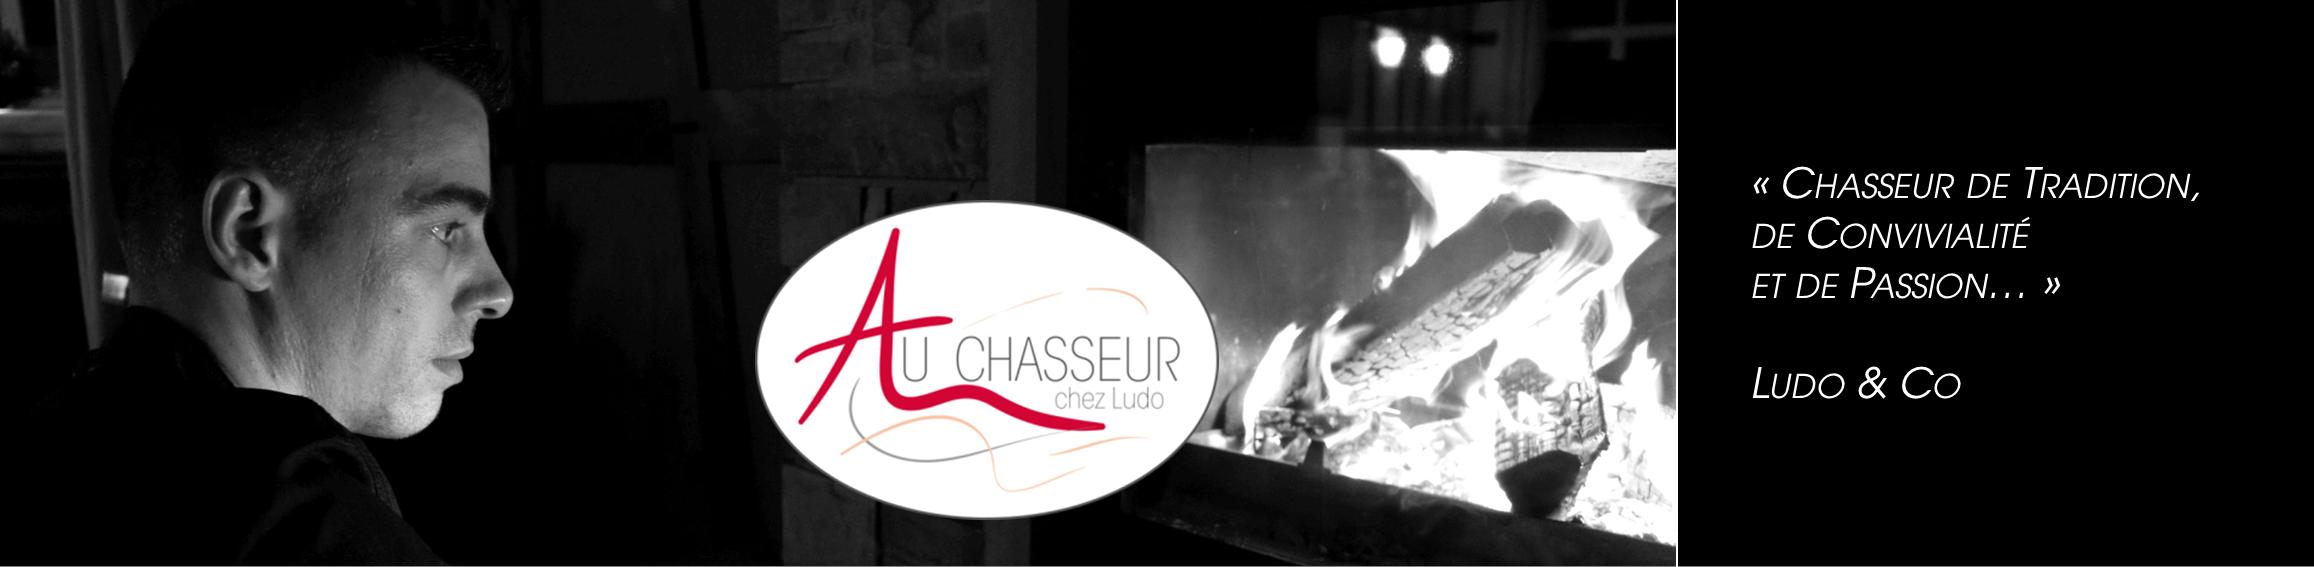 Restaurant Au Chasseur – Mietesheim